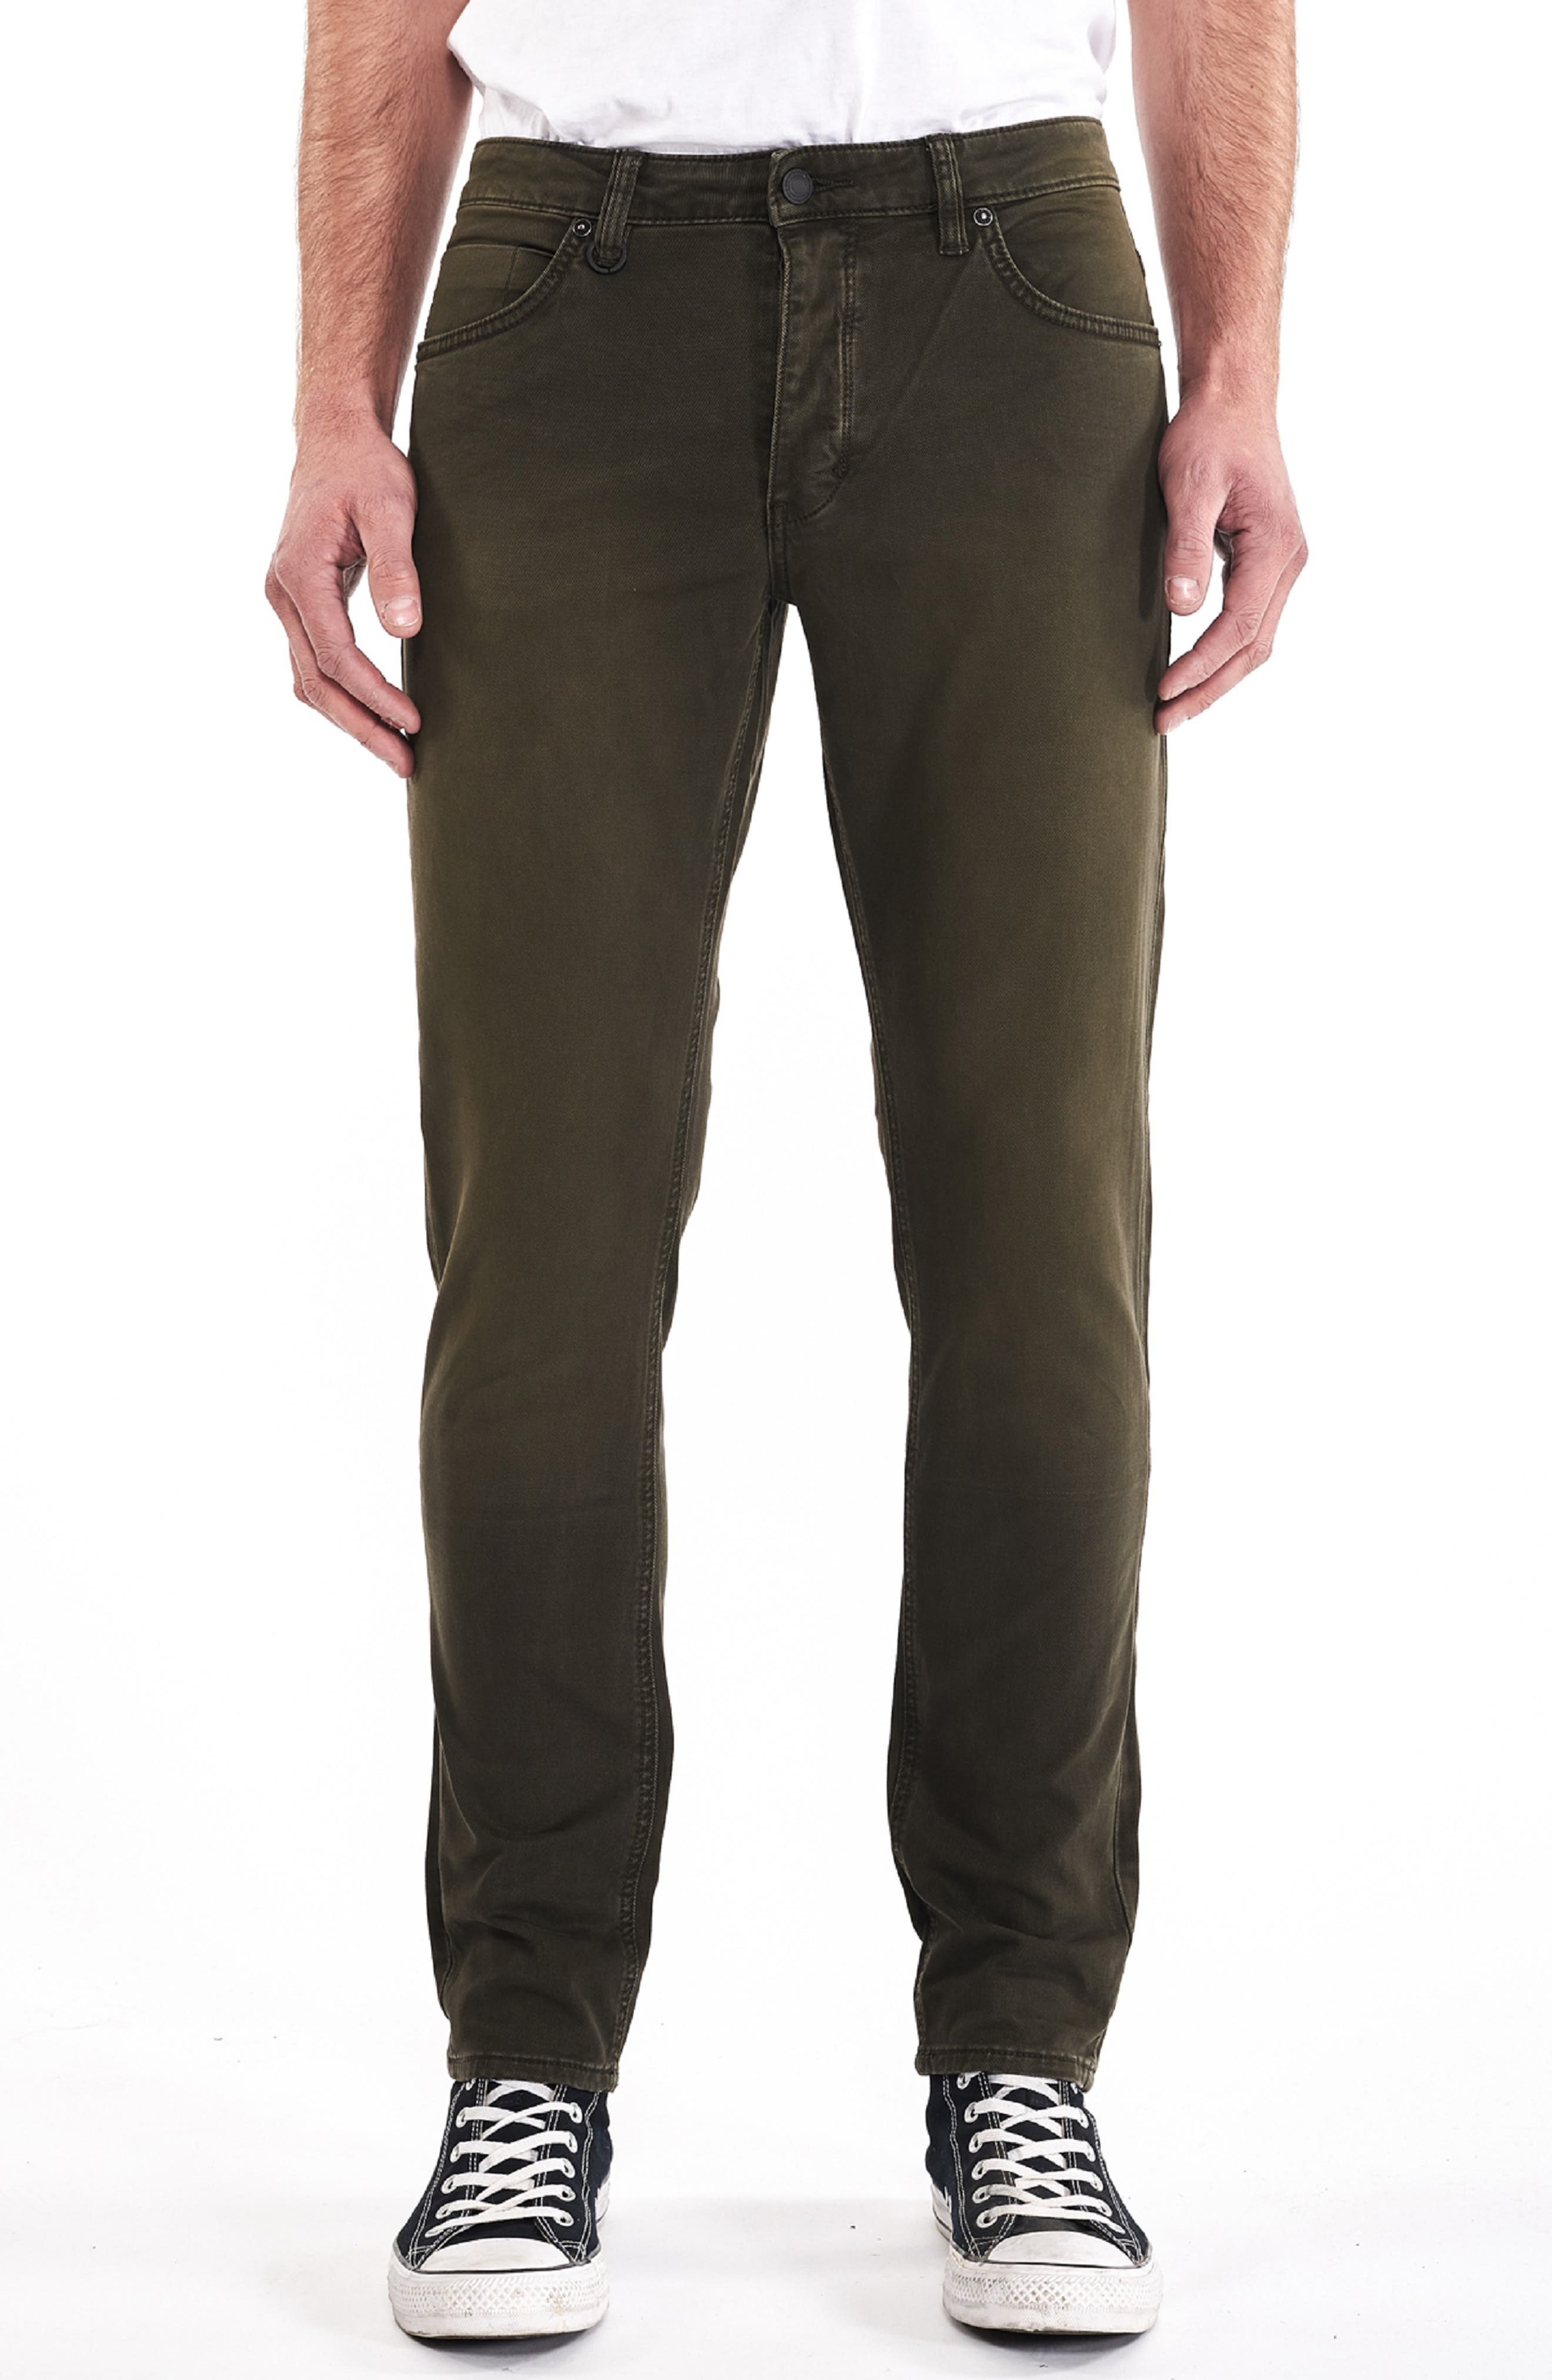 Lou Slim Fit Jeans,                         Main,                         color, ARMAGEDDON GREEN